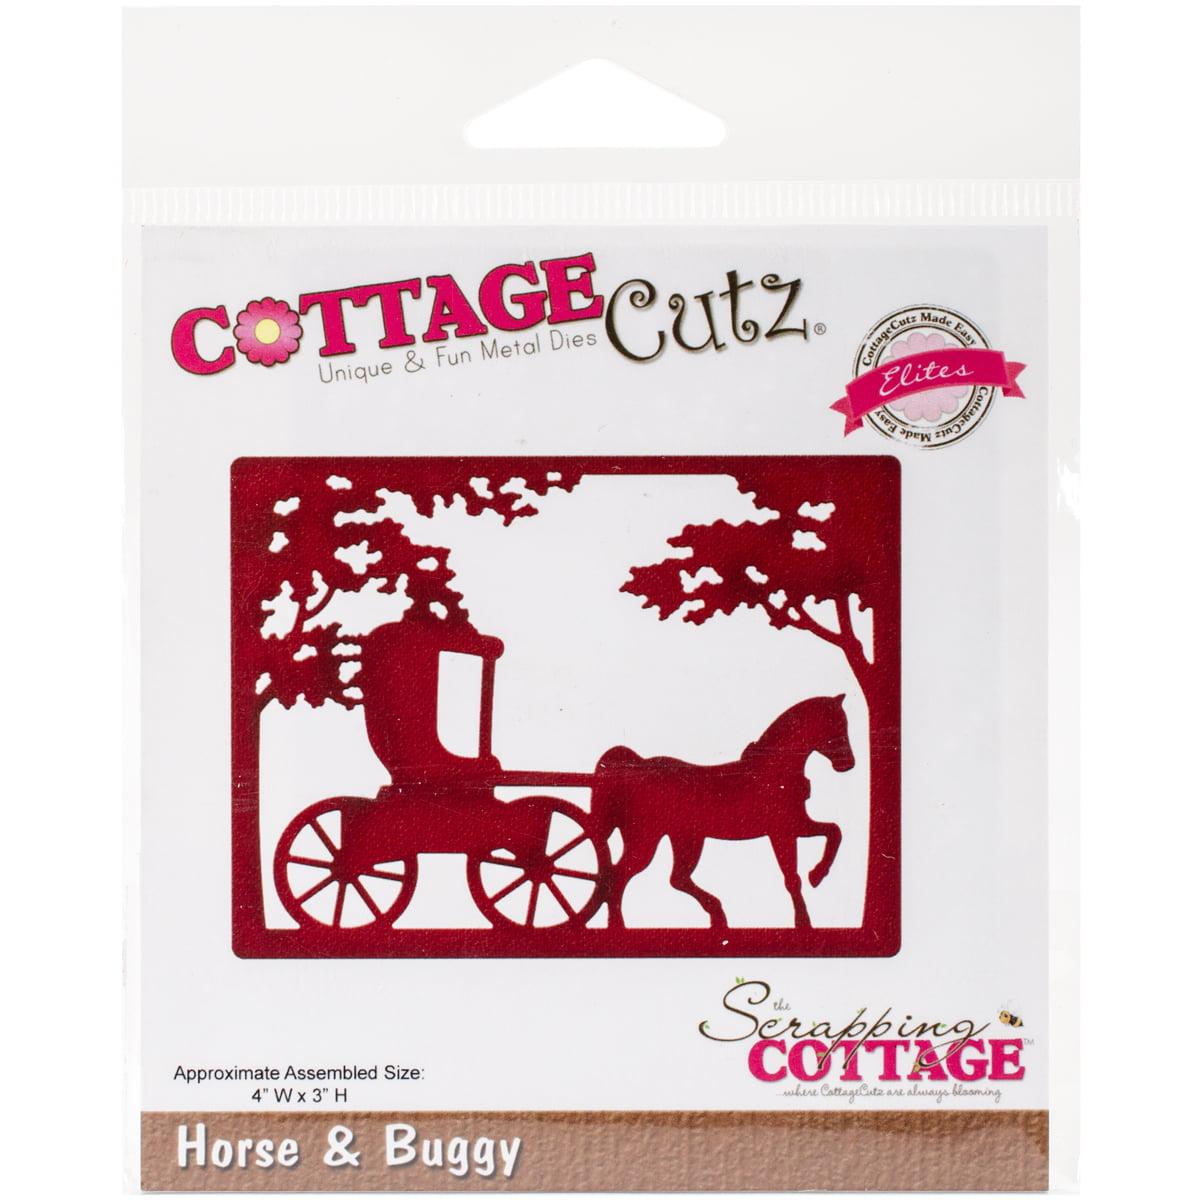 "CottageCutz Elites Die, Horse and Buggy, 4"" x 3"""